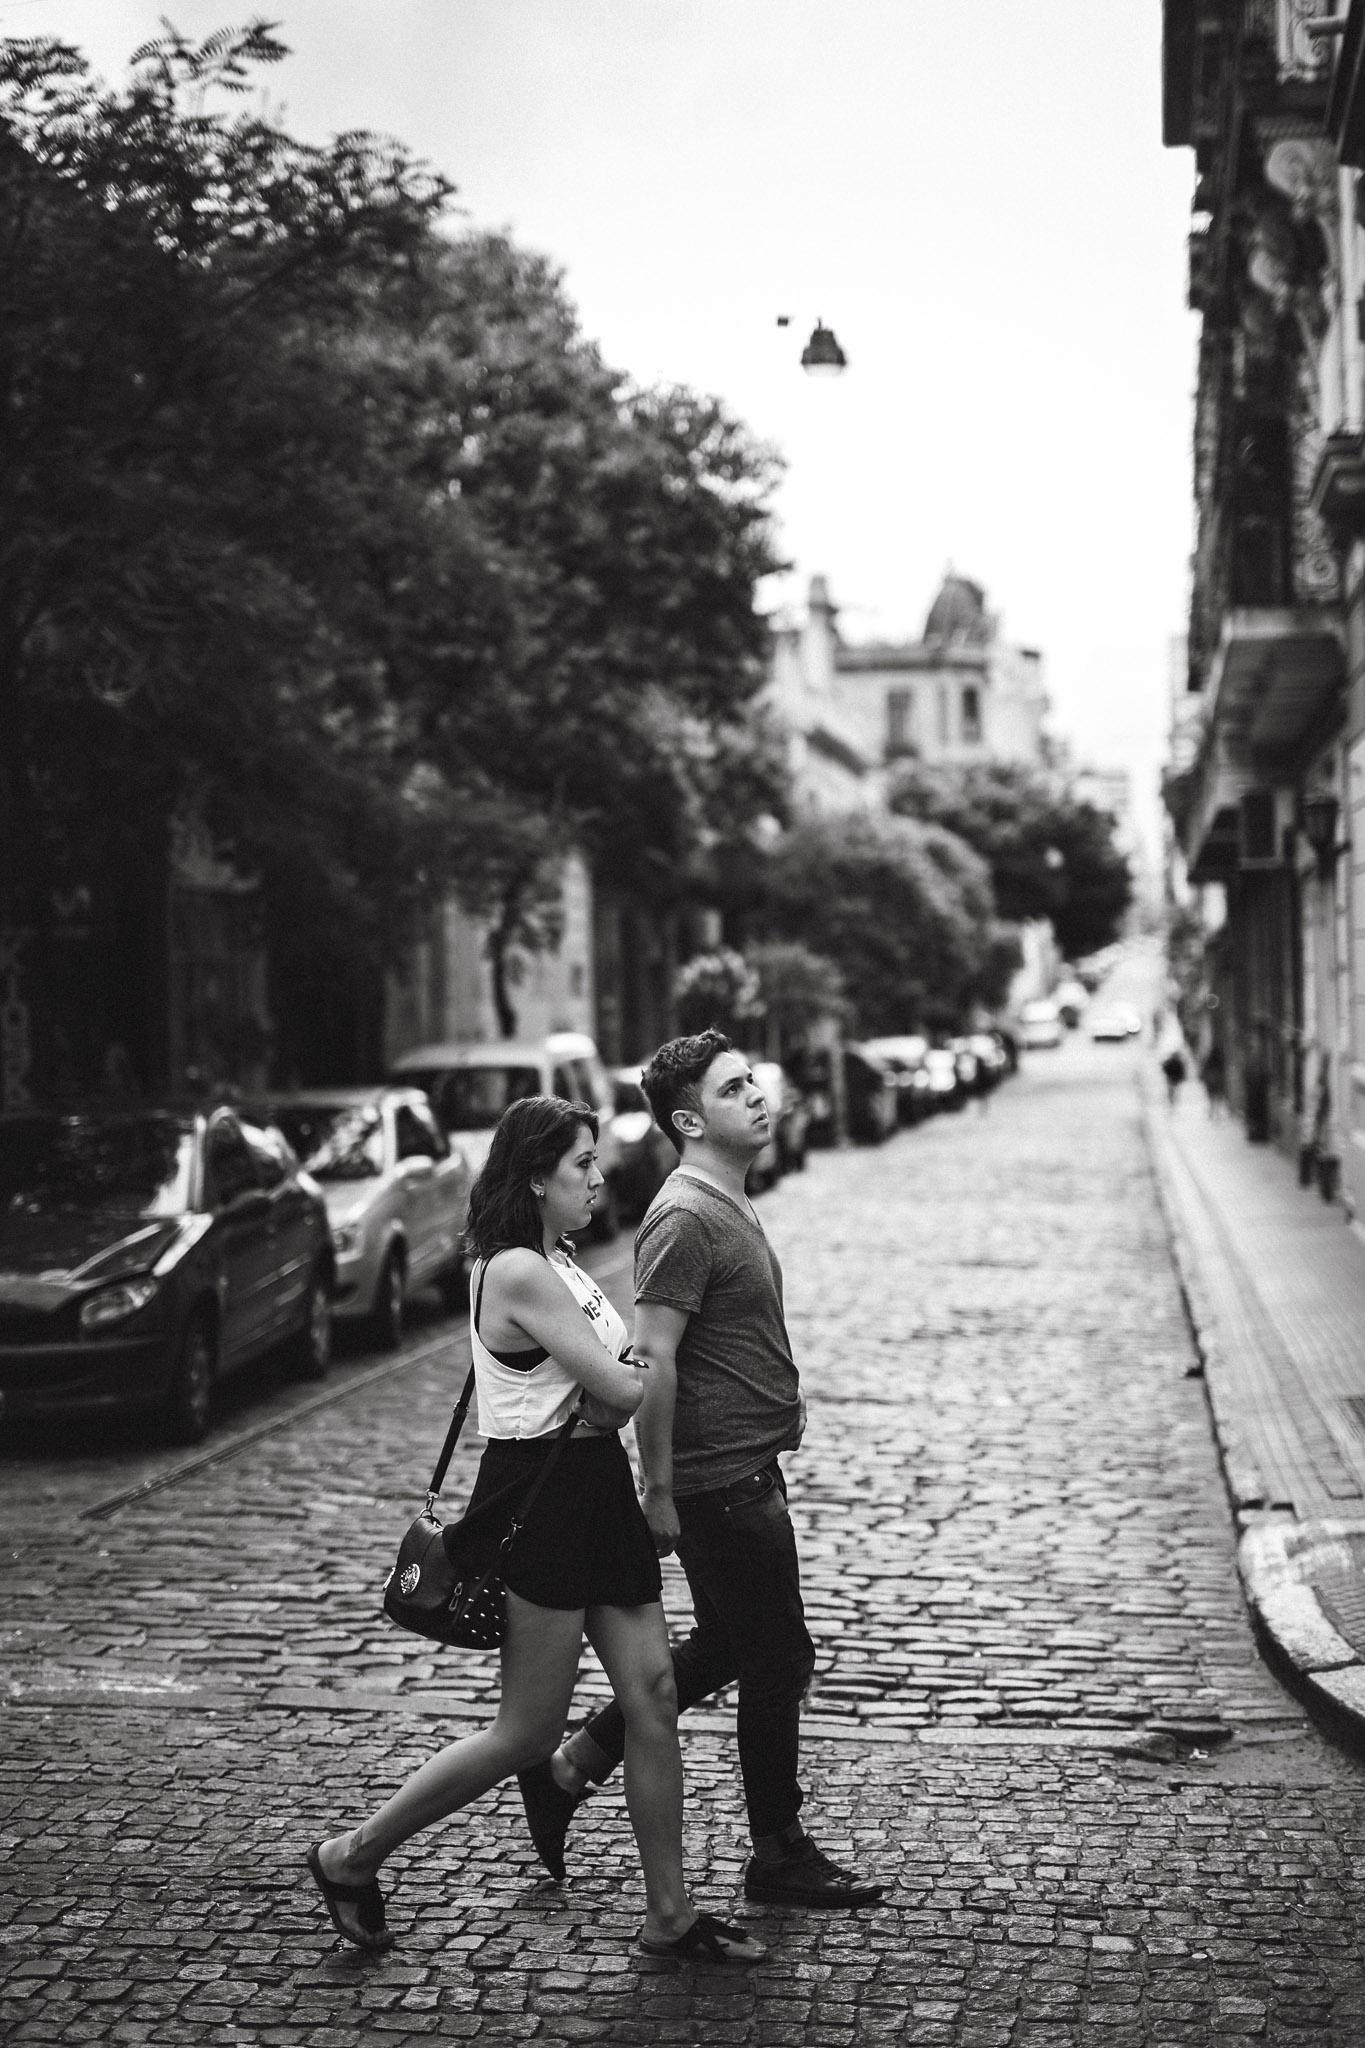 wedding-travellers-argentina-buenos-aires-san-telmo